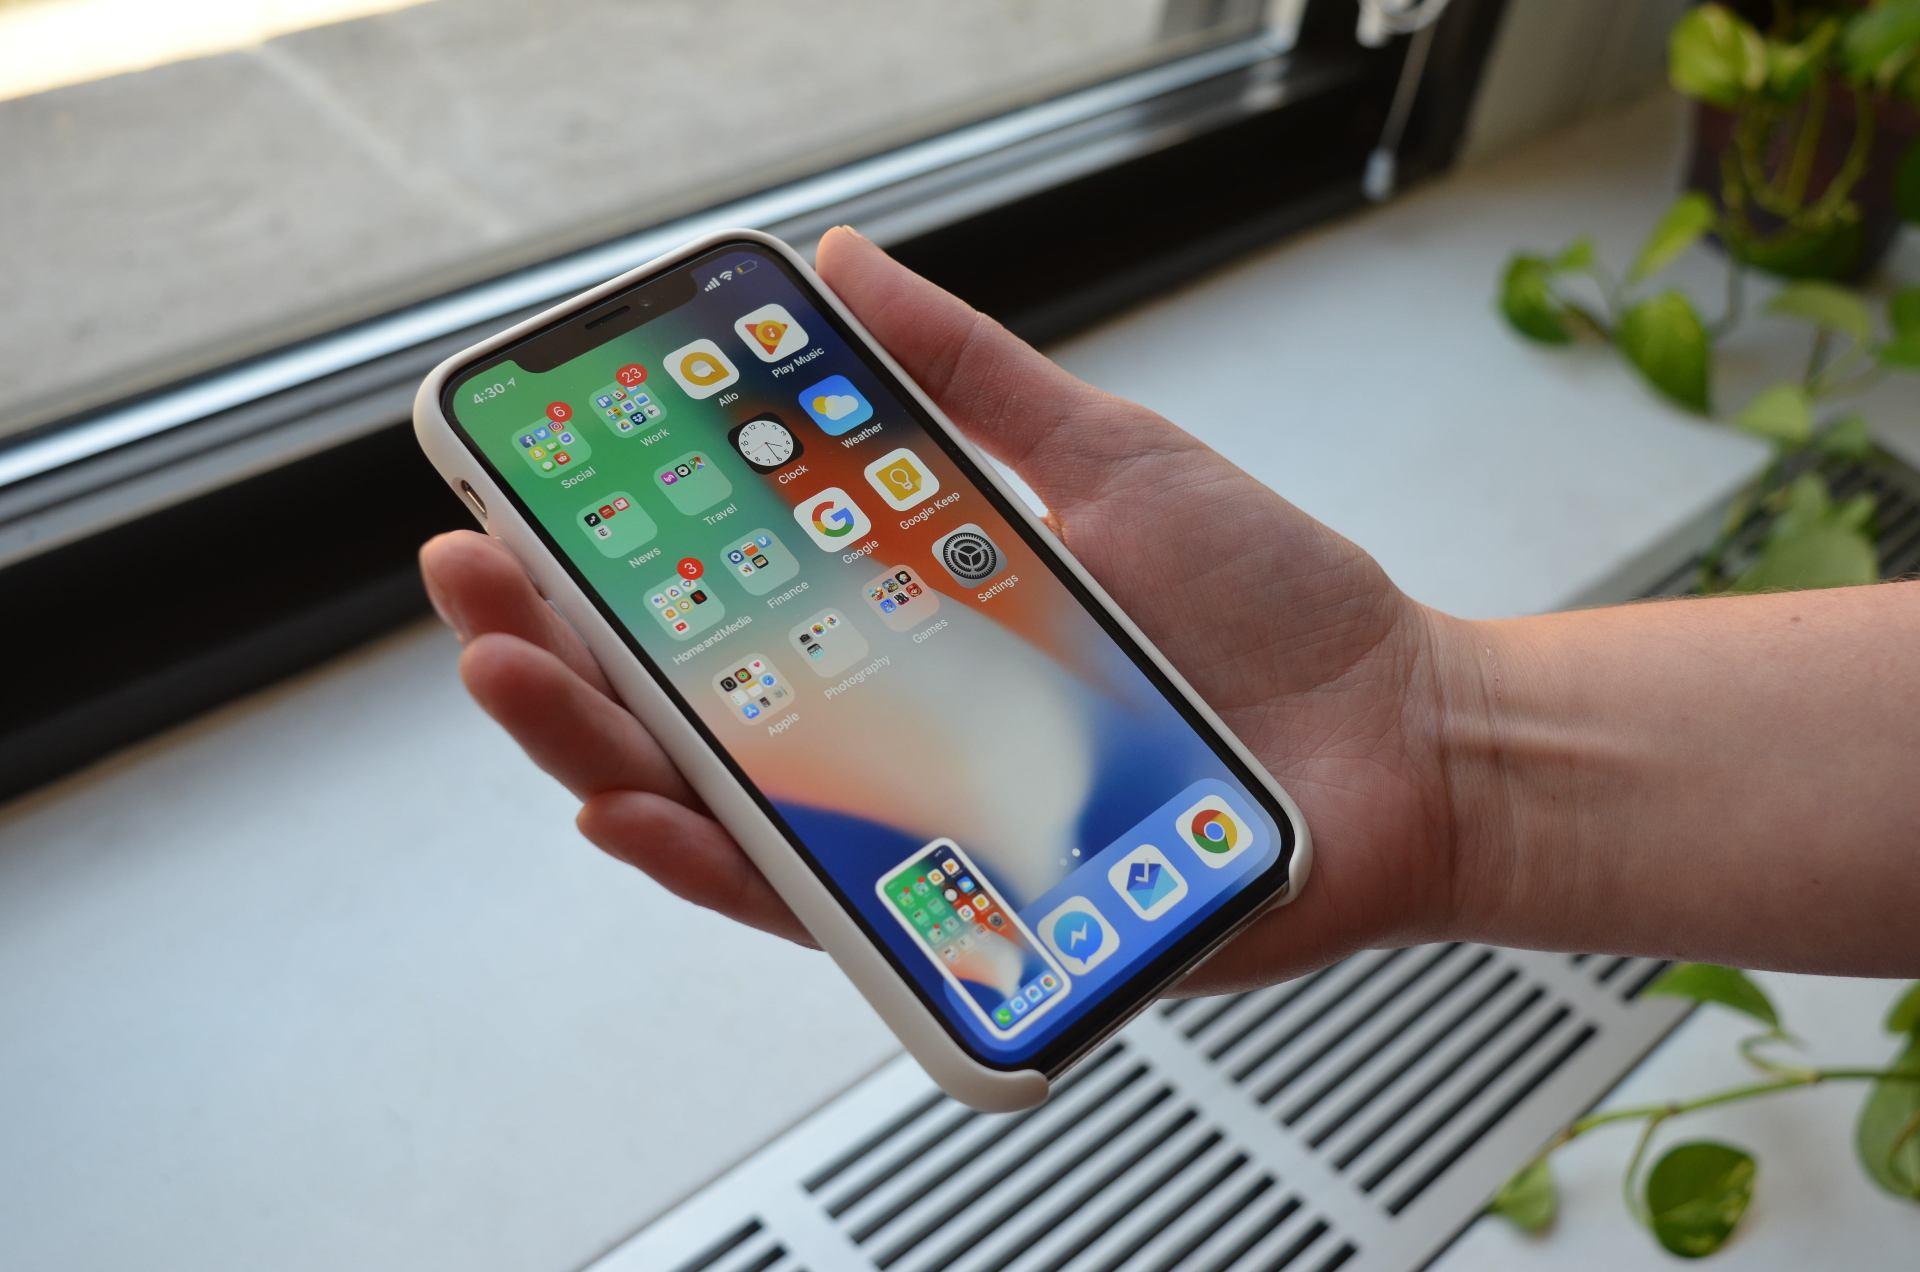 Замена заднего стекла на iPhone X и iPhone 11 Pro Max: этапы работ и цена услуги